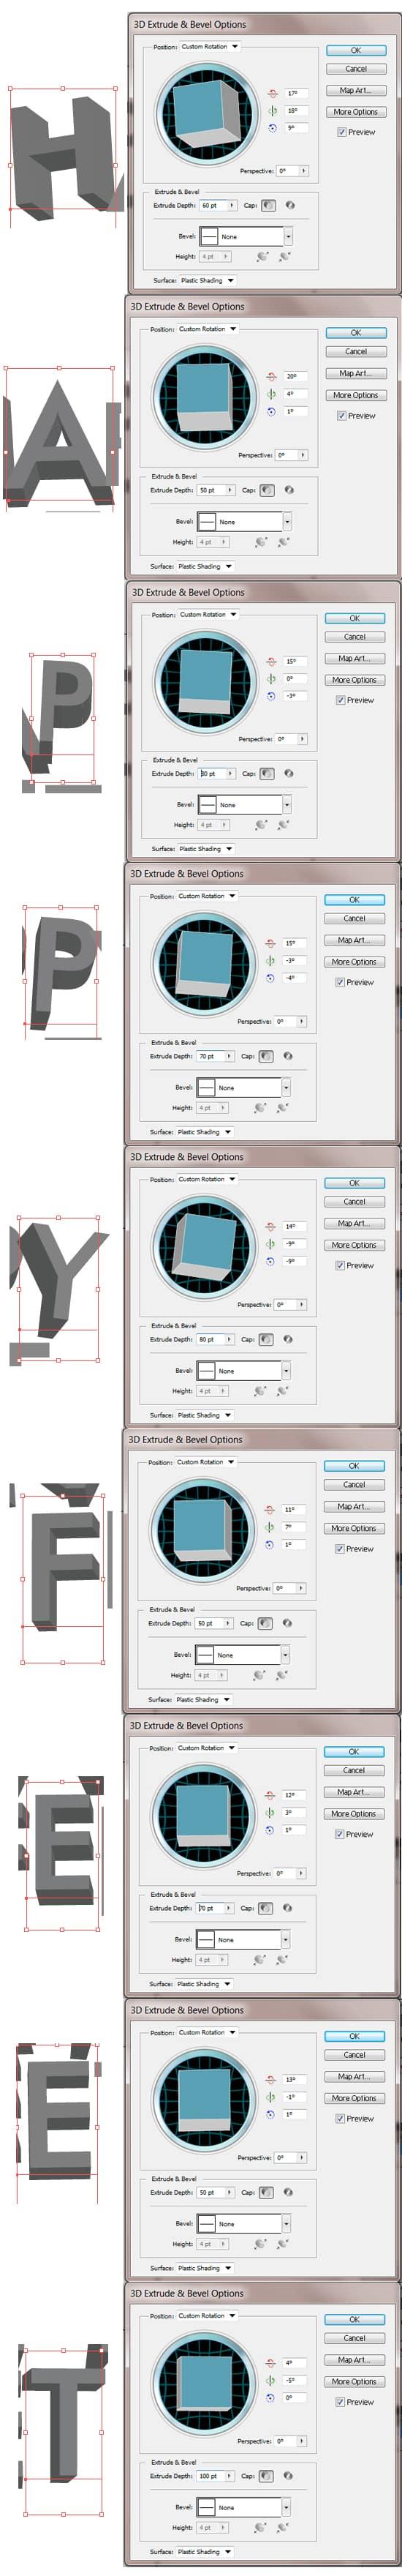 Create Happy Feet Font - Text Effect Illustrator Tutorial -DesignBump